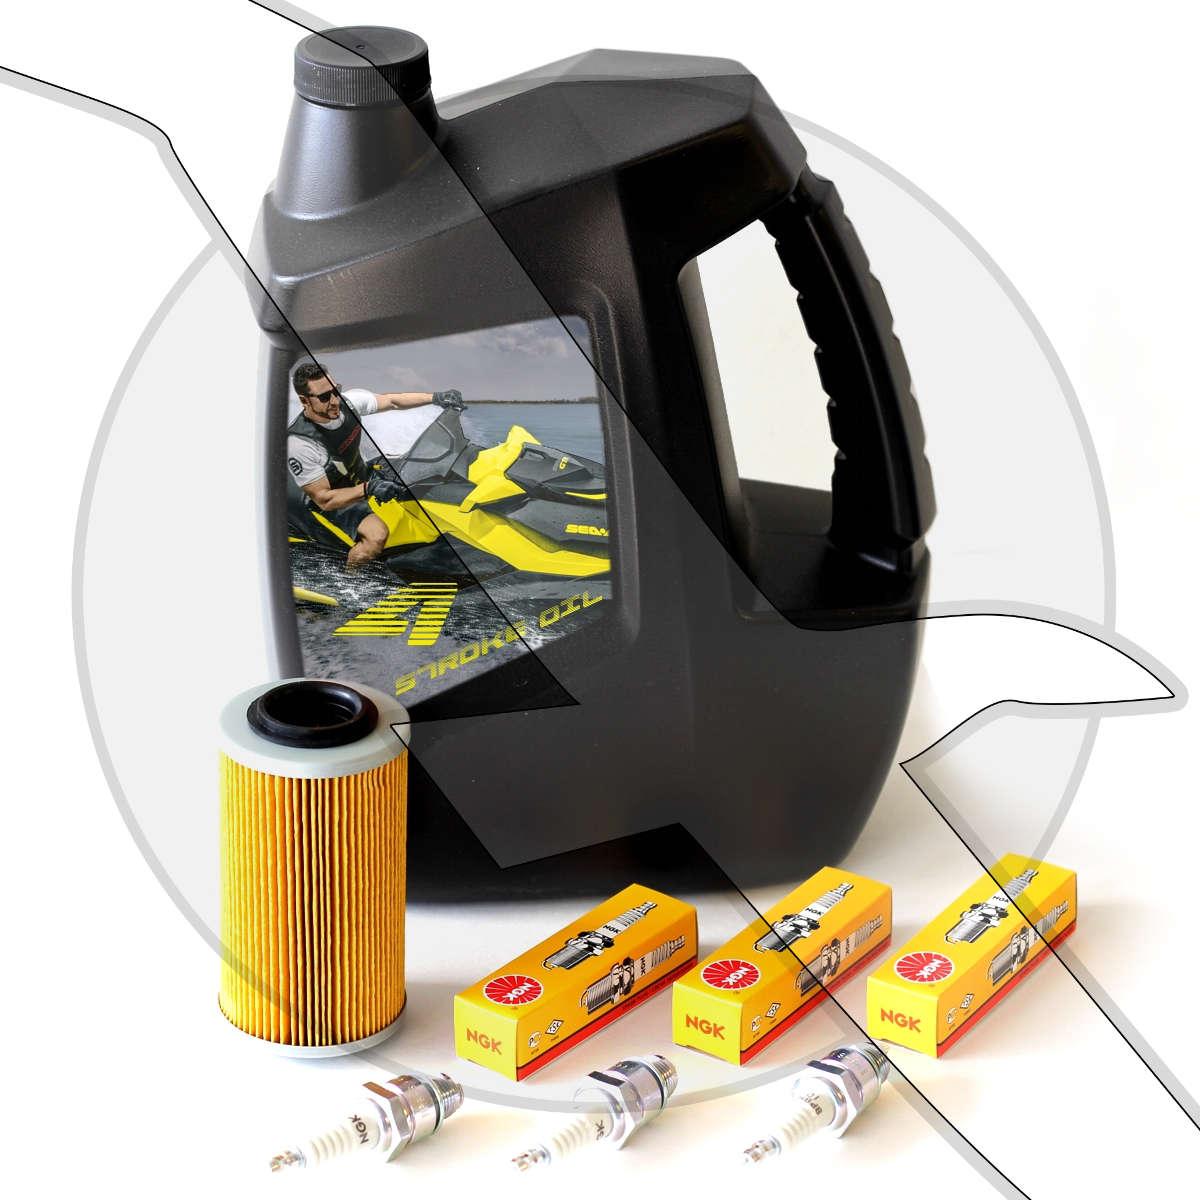 Details about Oil & Filter Spark Plug Change Kit Sea Doo 4 TEC GTI GTX RXT  RXP 4 Stroke Seadoo